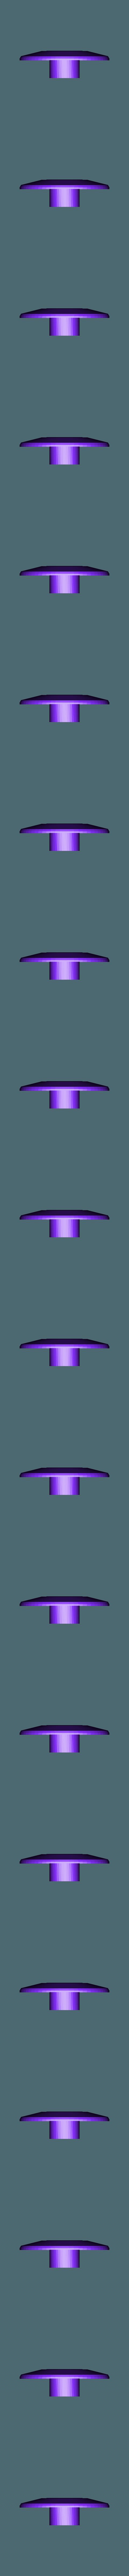 cache jante.STL Download free STL file Rim 2 HP 1/10 R/C Tamiya M-chassis • Model to 3D print, Michael_moi